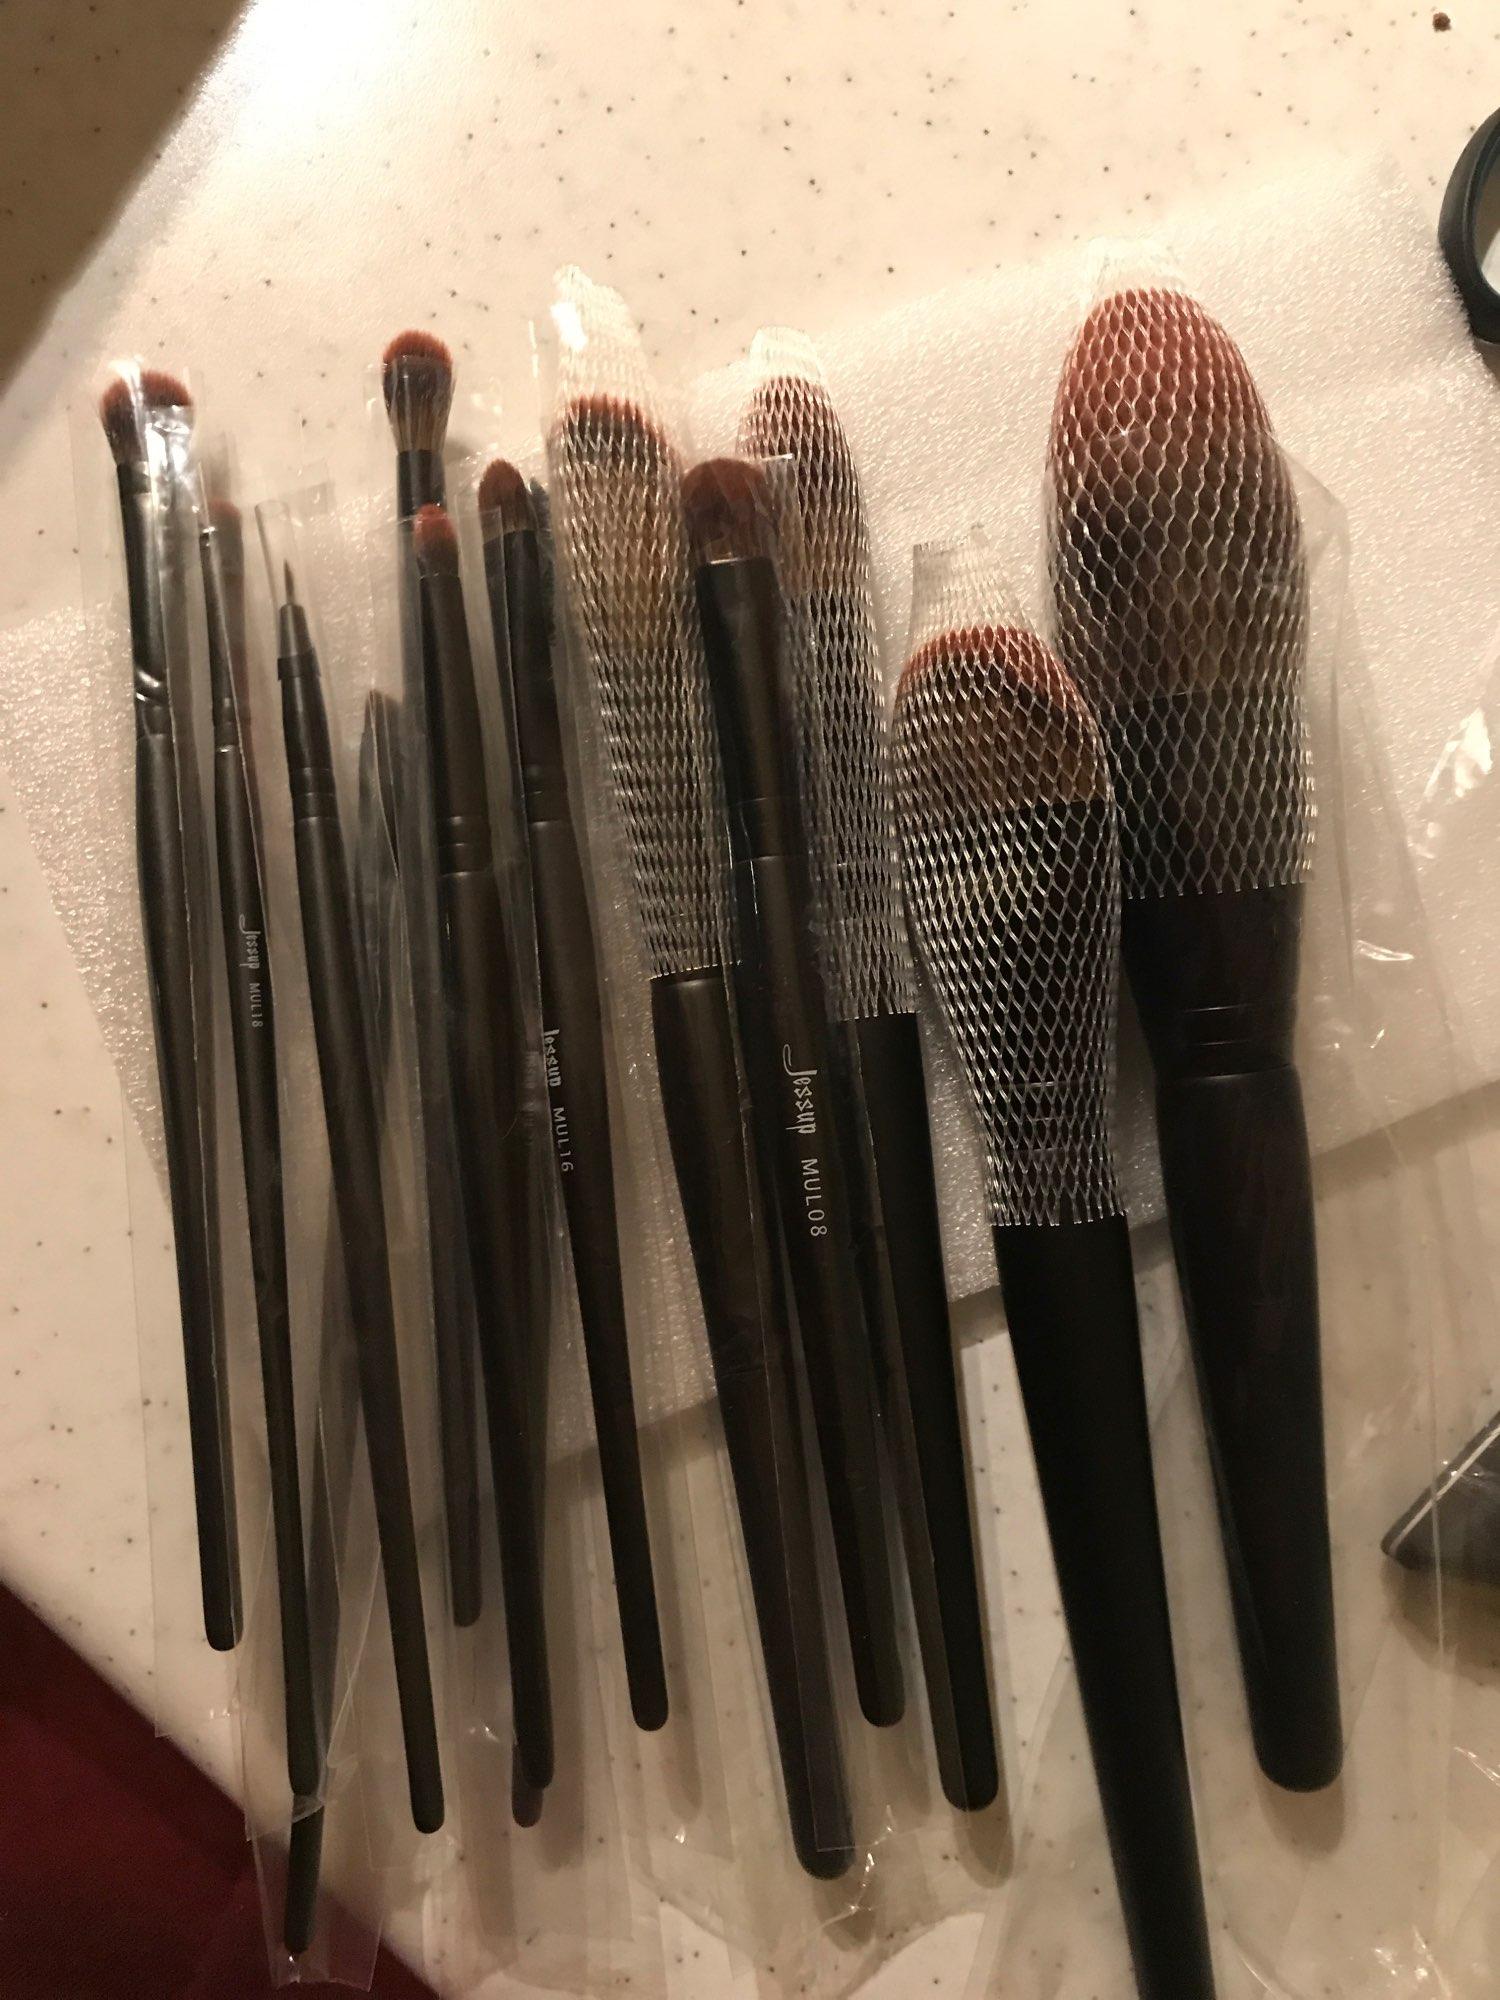 Jessup New Arrival Makeup brushes brushes Phantom Black 3-21pcs Foundation brush Powder Concealer Eyeshadow Synthetic hair reviews №1 235811